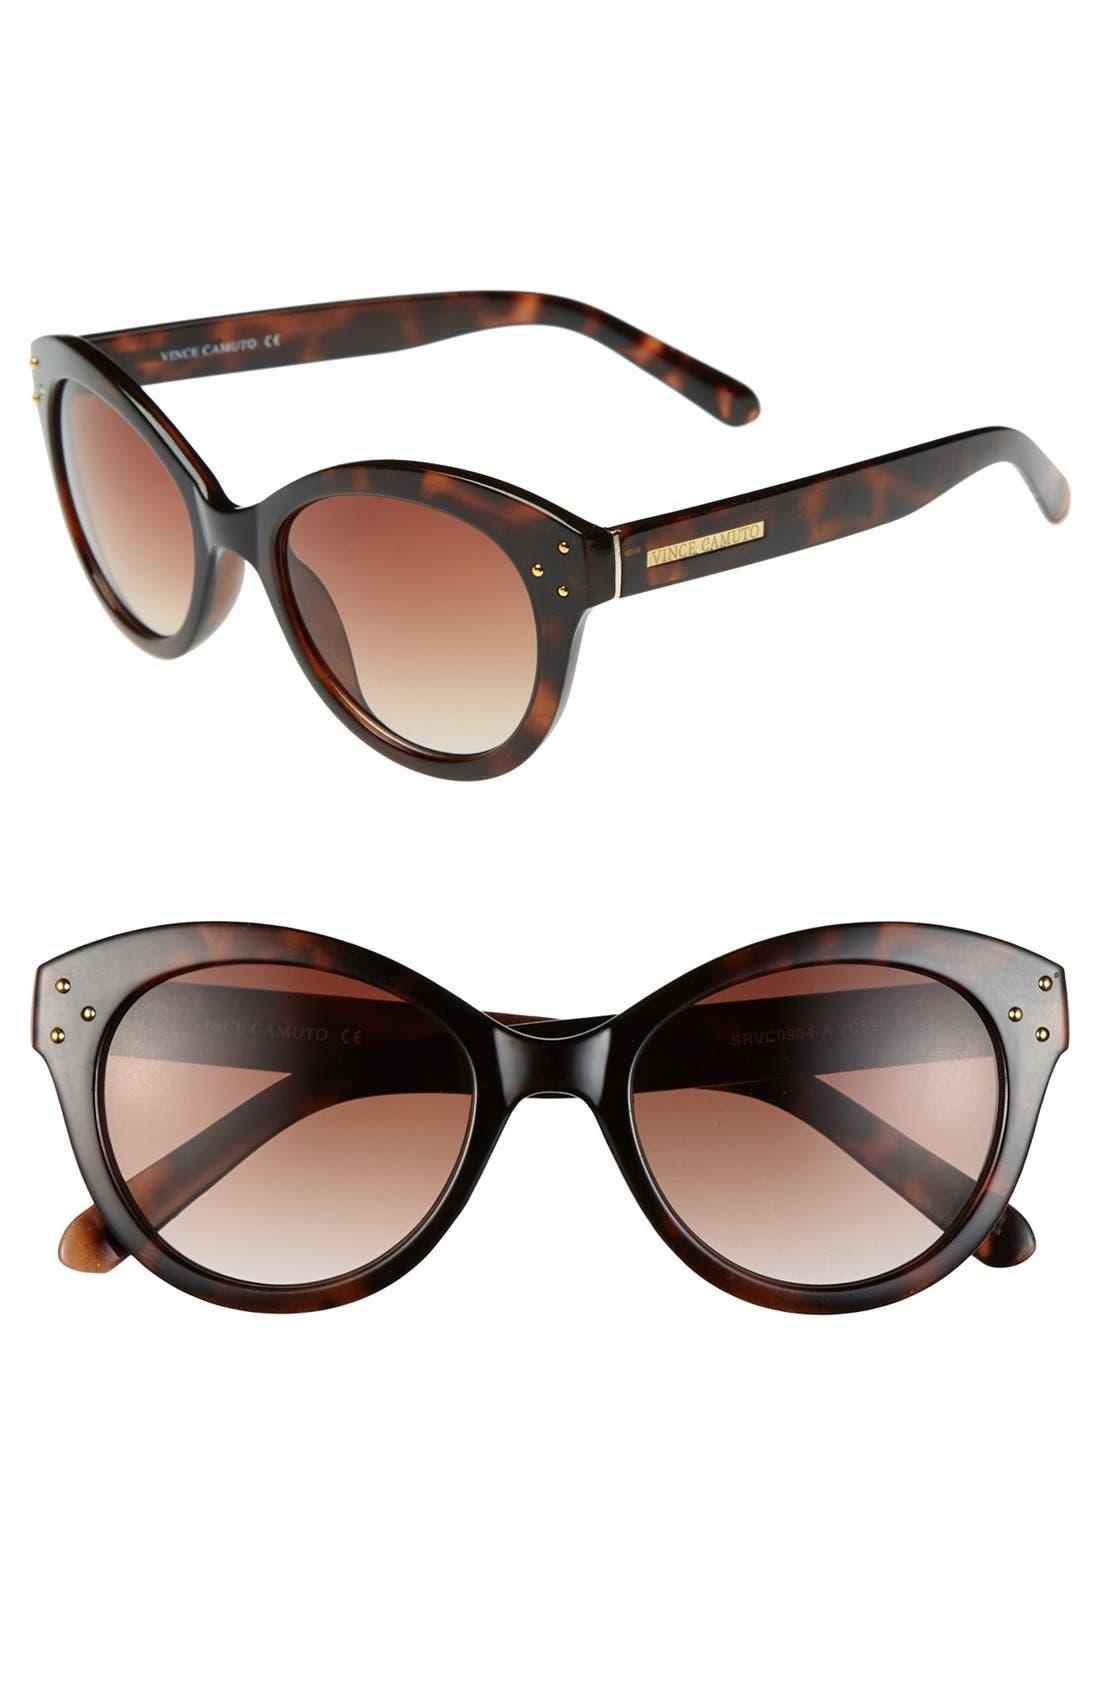 Main Image - Vince Camuto 51mm Retro Cat Eye Sunglasses